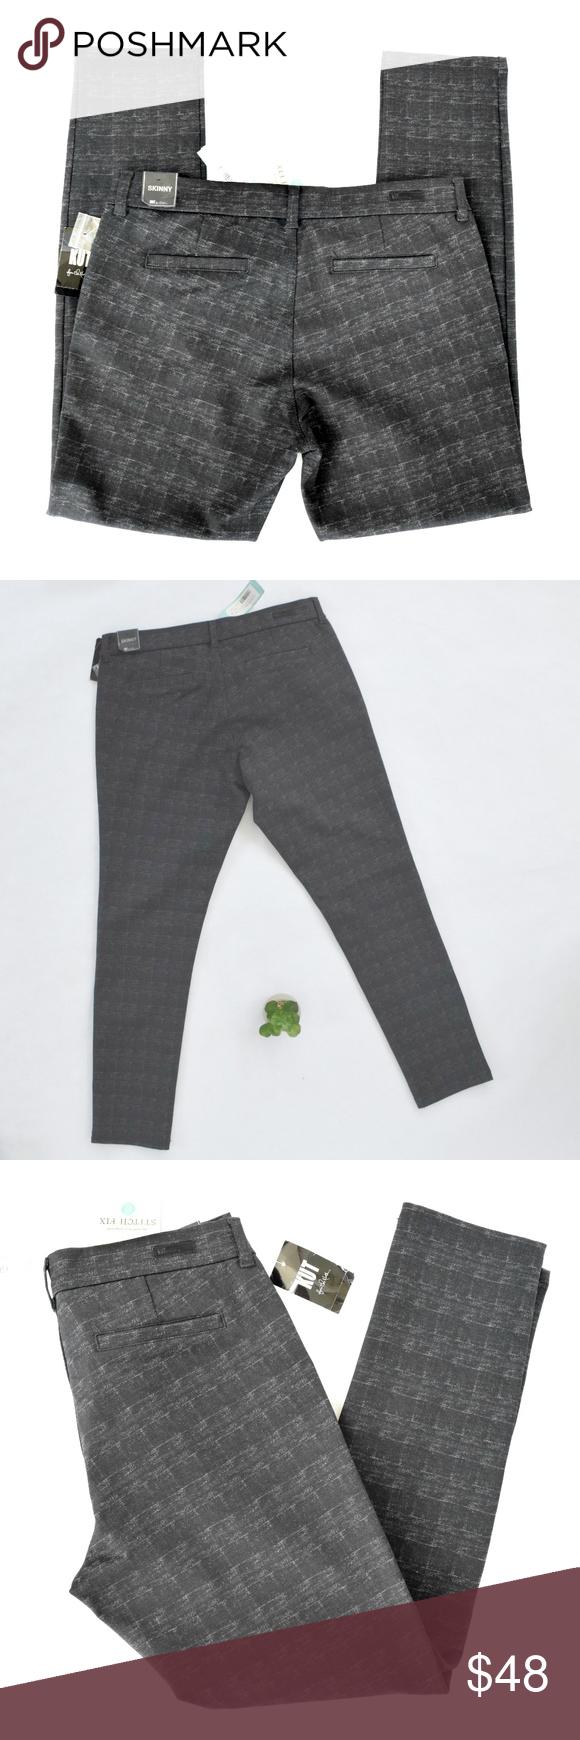 Kut From The Kloth Stitch Fix Stefany Skinny Pant Skinny Pants Kut From The Kloth Skinny